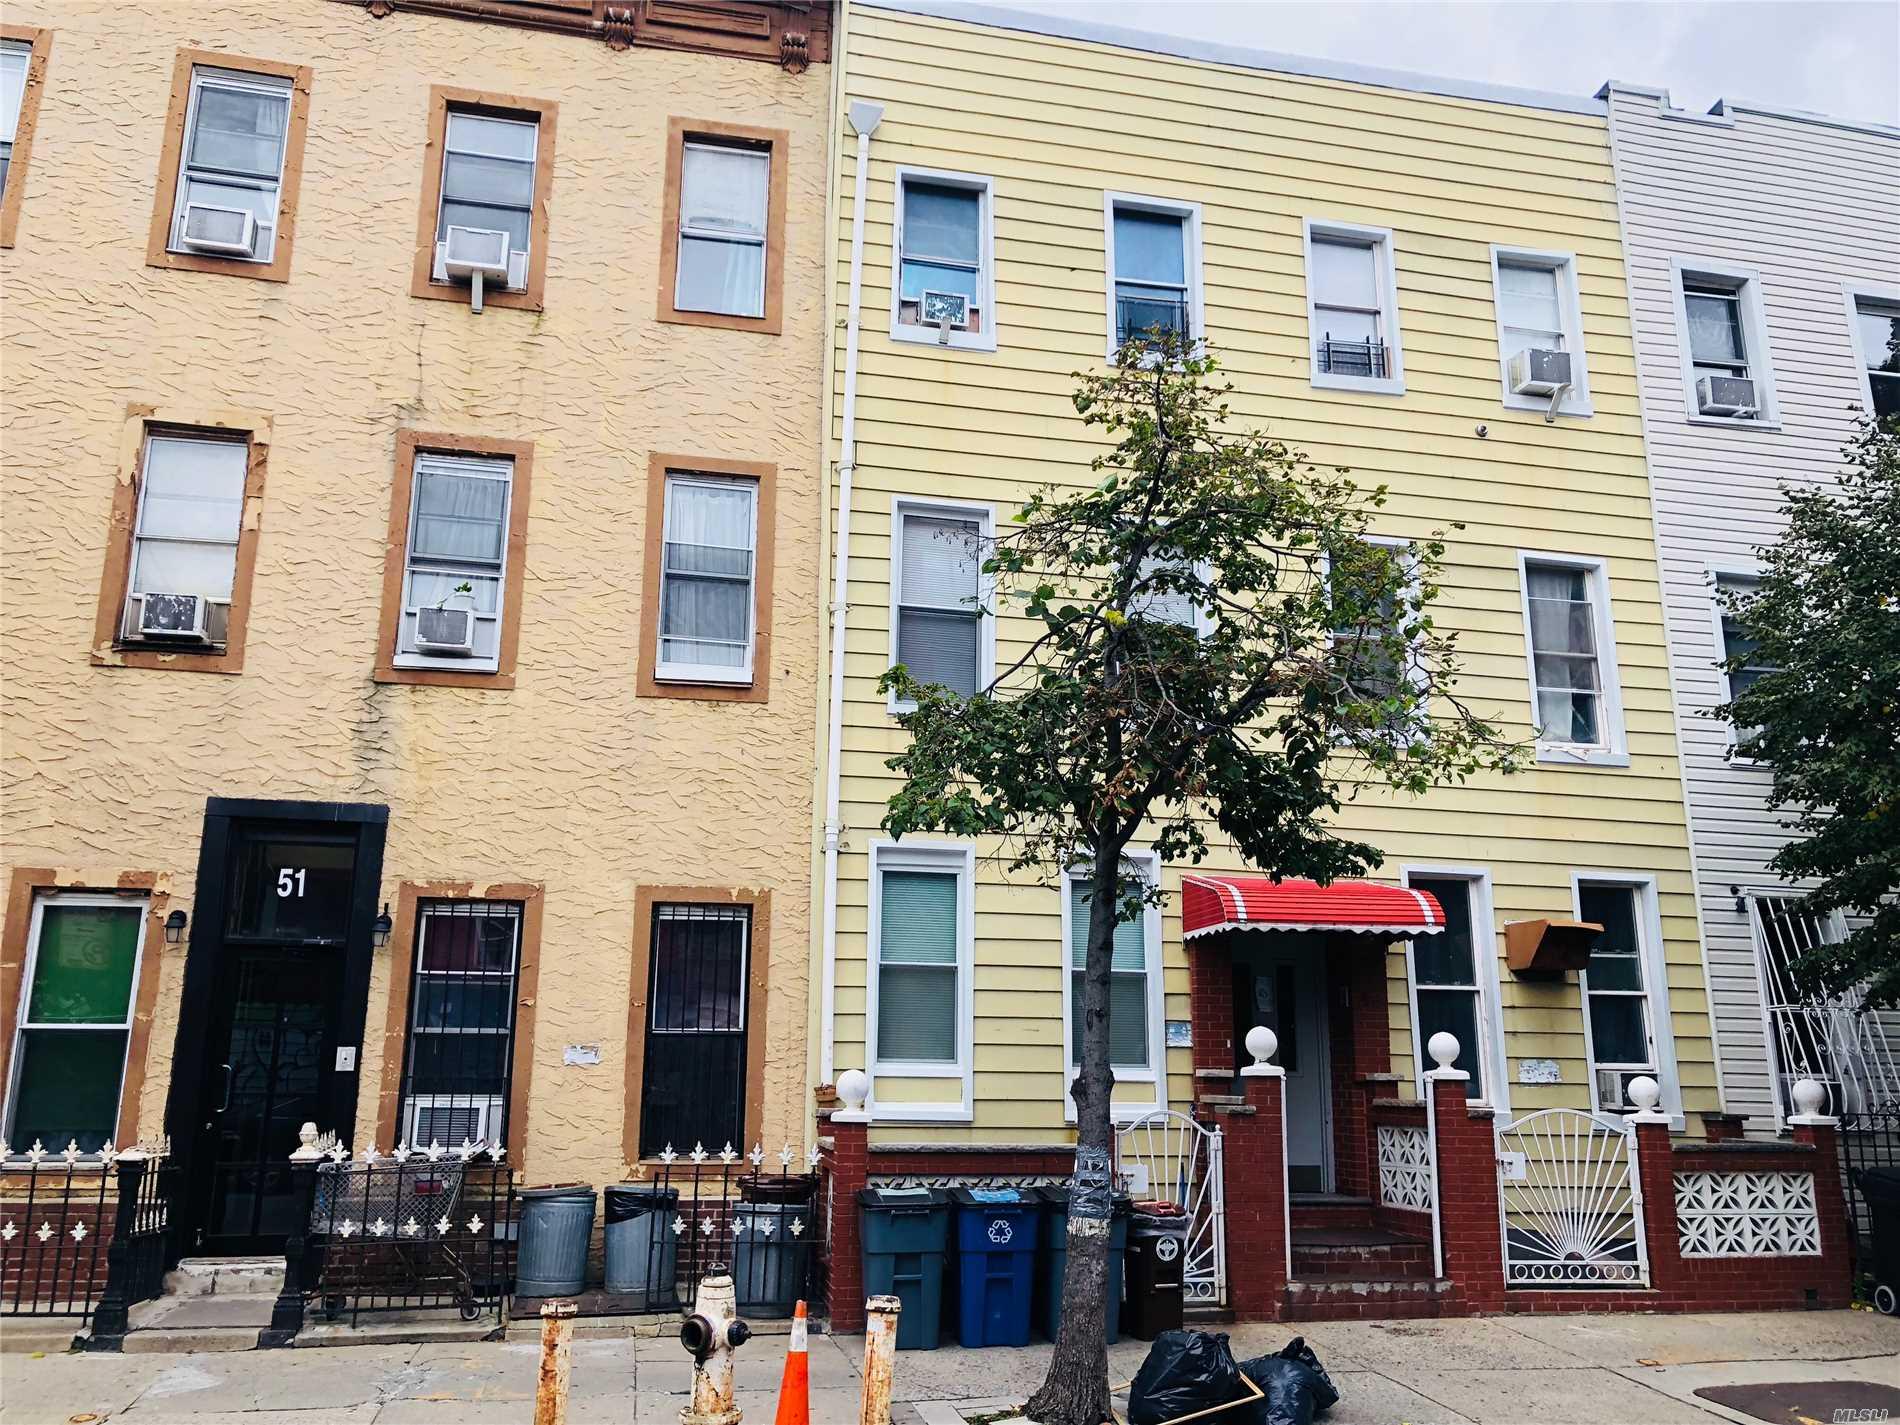 53 Ten Eyck St, 2L - Brooklyn Other, New York